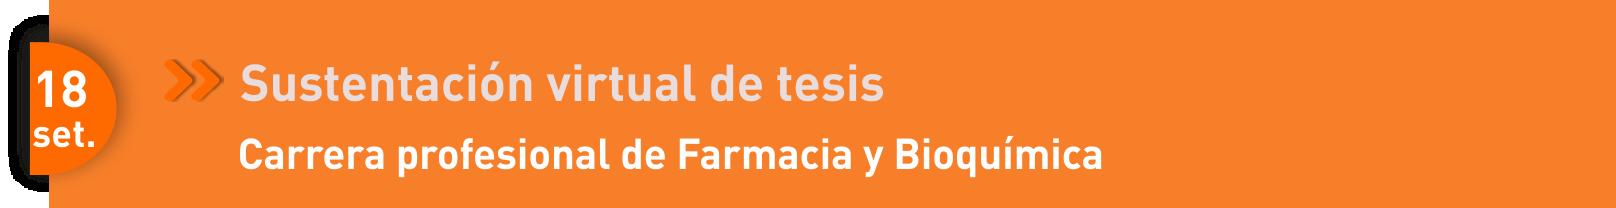 diseños web farmacia18 set